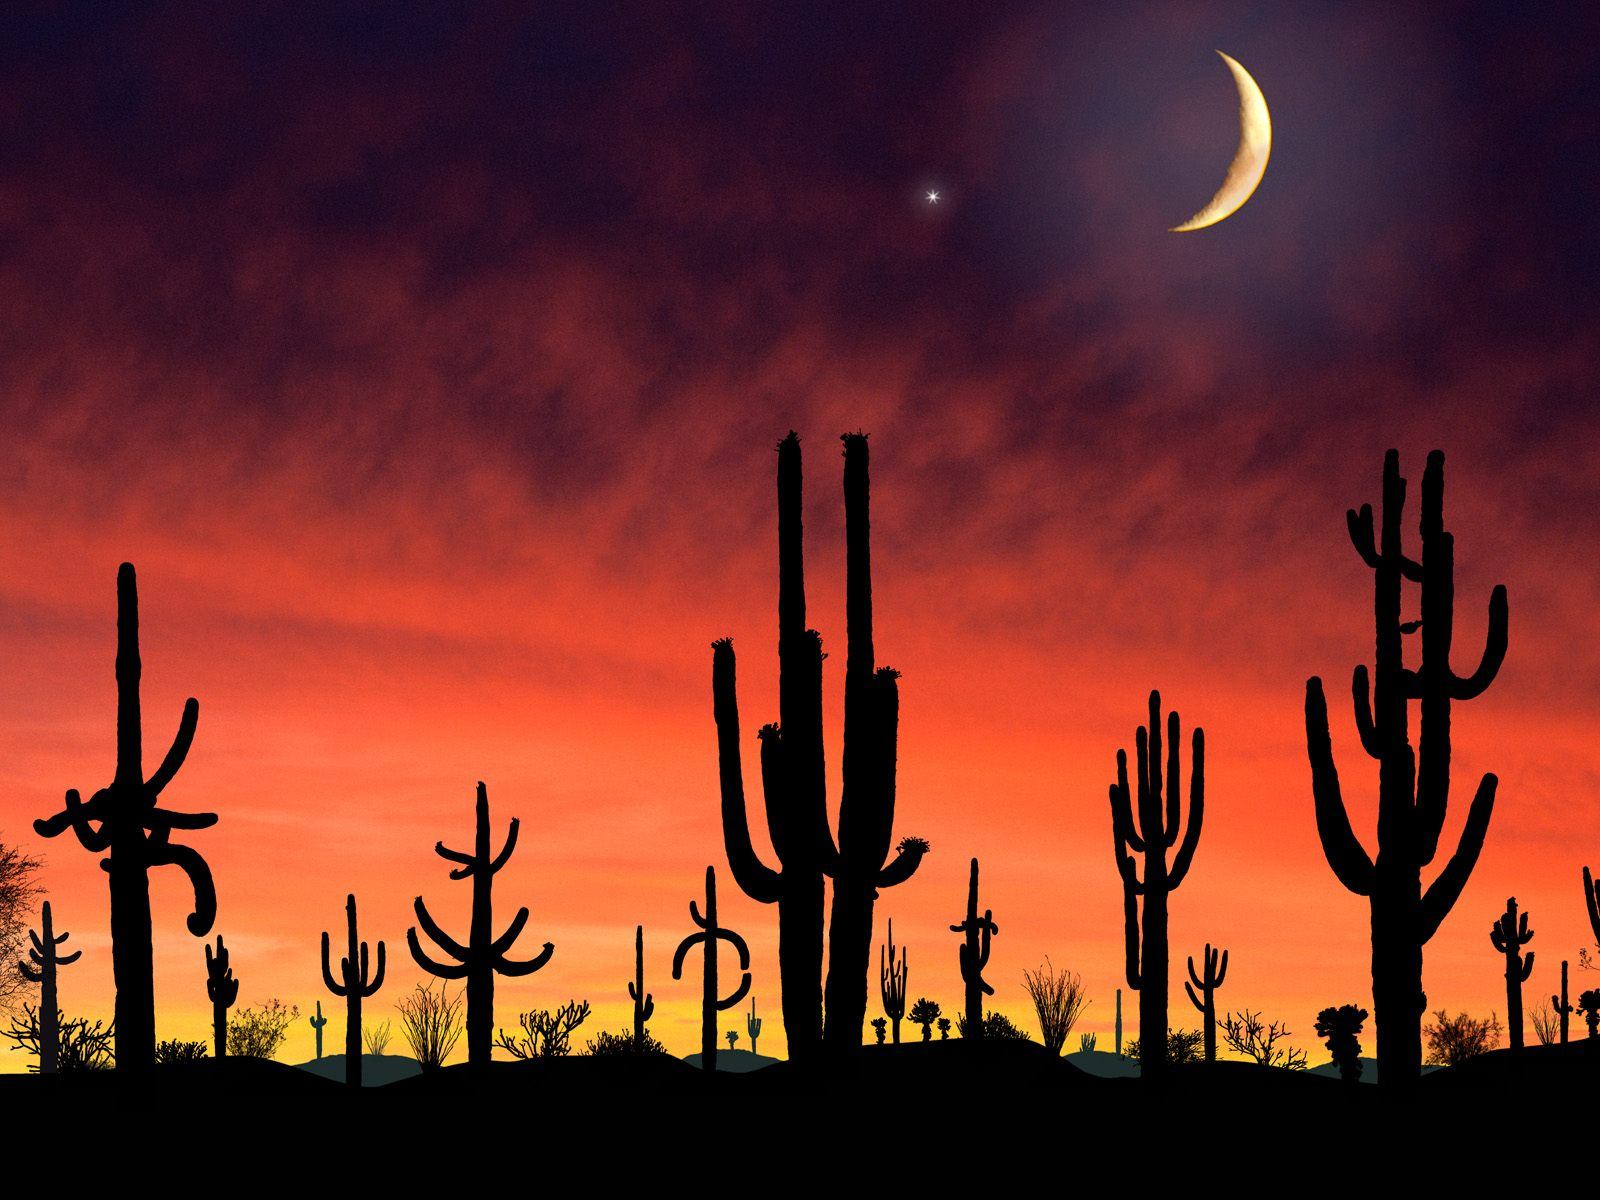 Arizona Wildcats Iphone Wallpaper Saguaro national park arizona 1600x1200